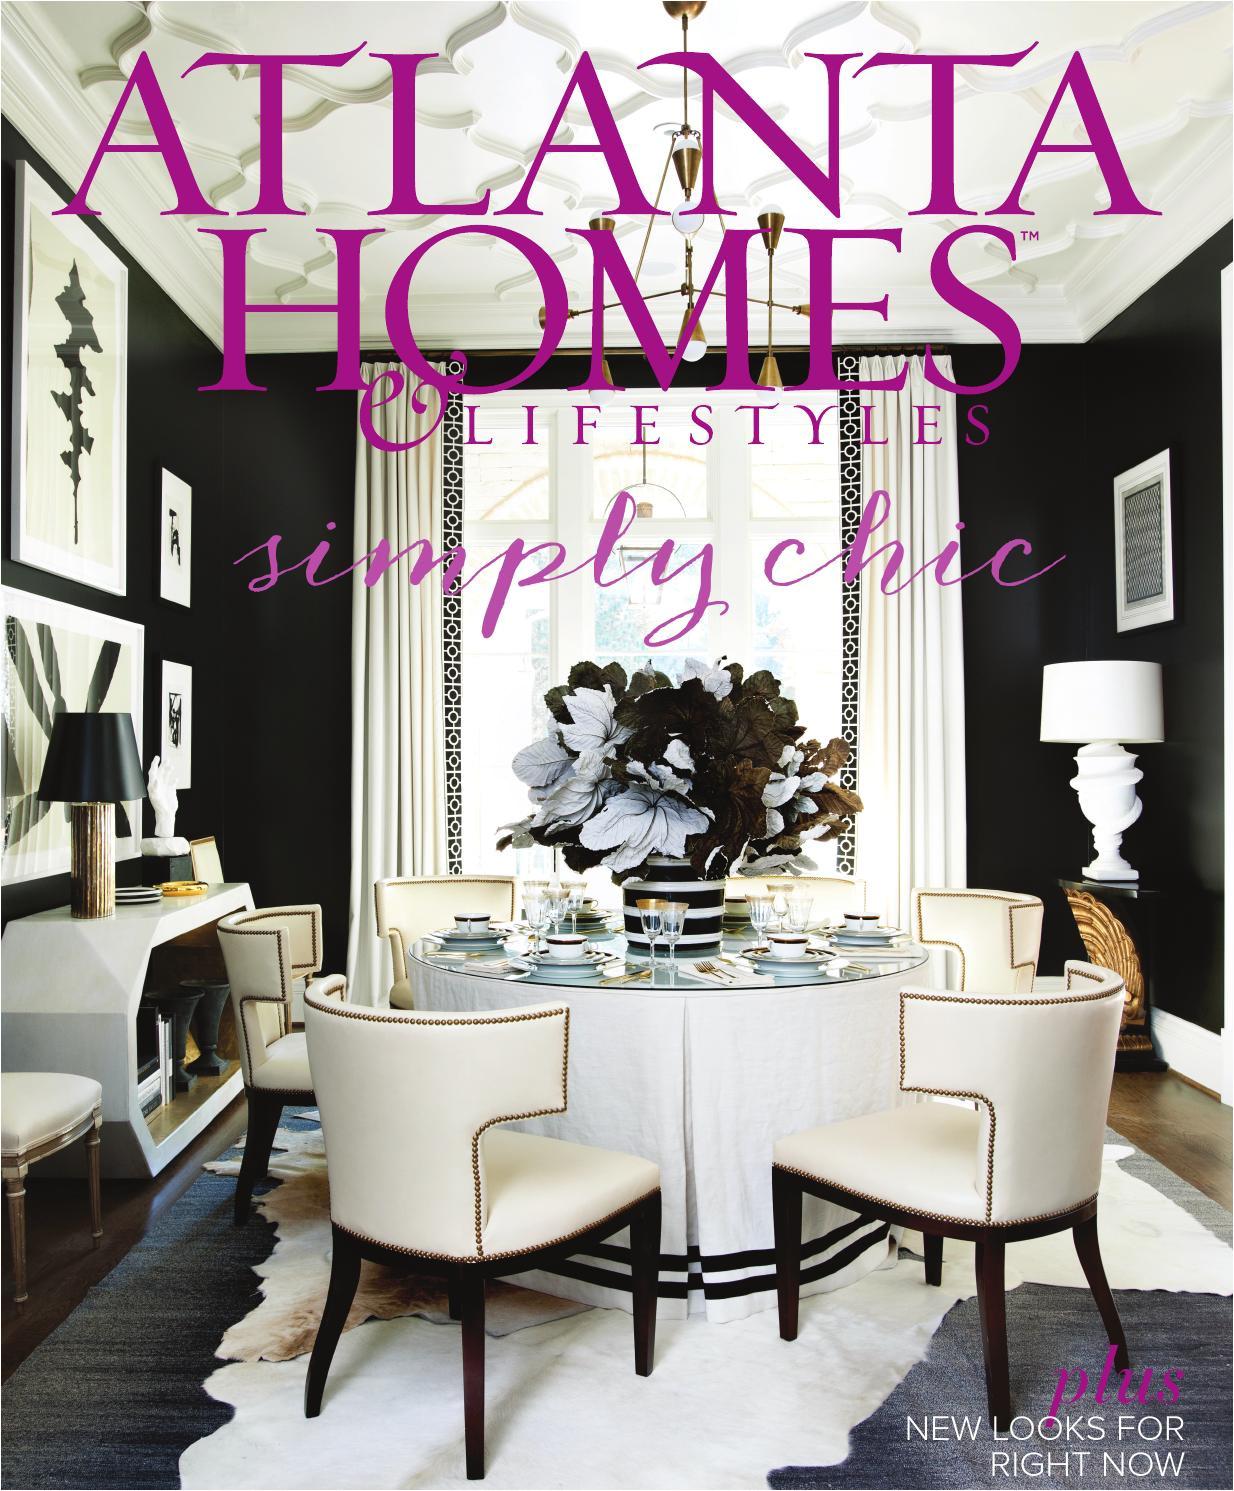 atlanta homes lifestyles february 2015 issue by atlanta homes lifestyles issuu